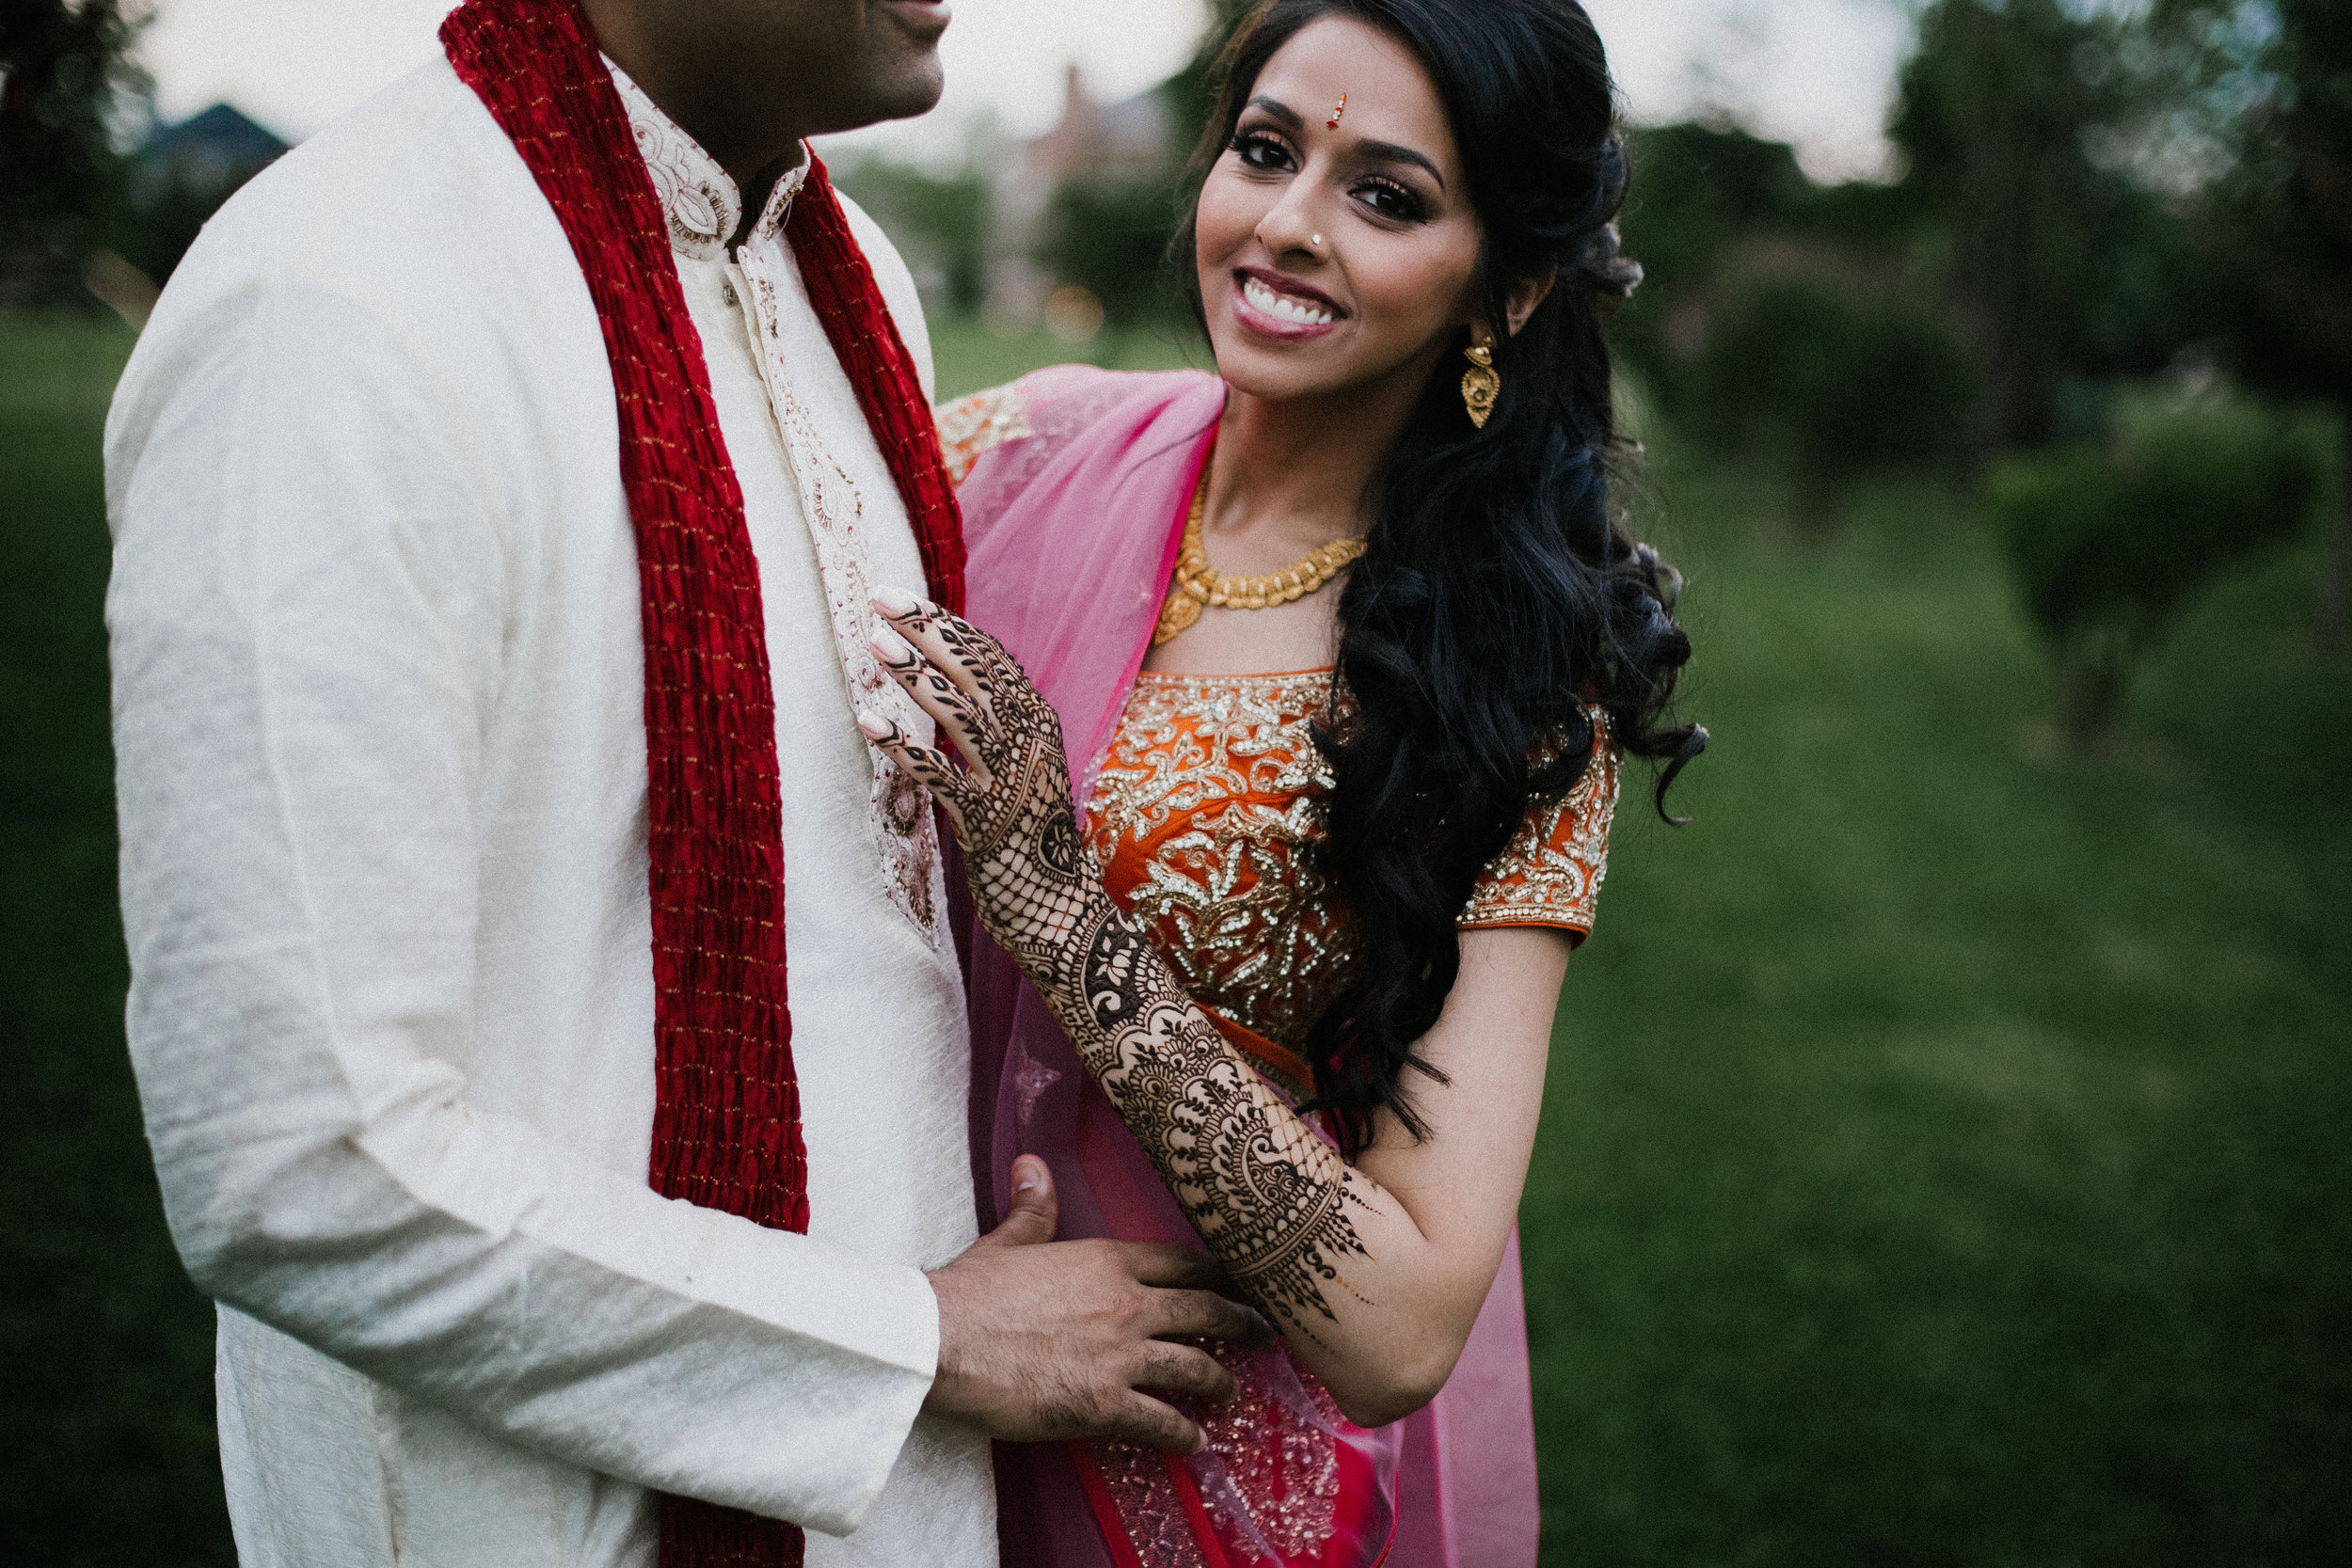 Aparna-Ankit-Patel-Mehndi-Wedding-Photos-0076.jpg